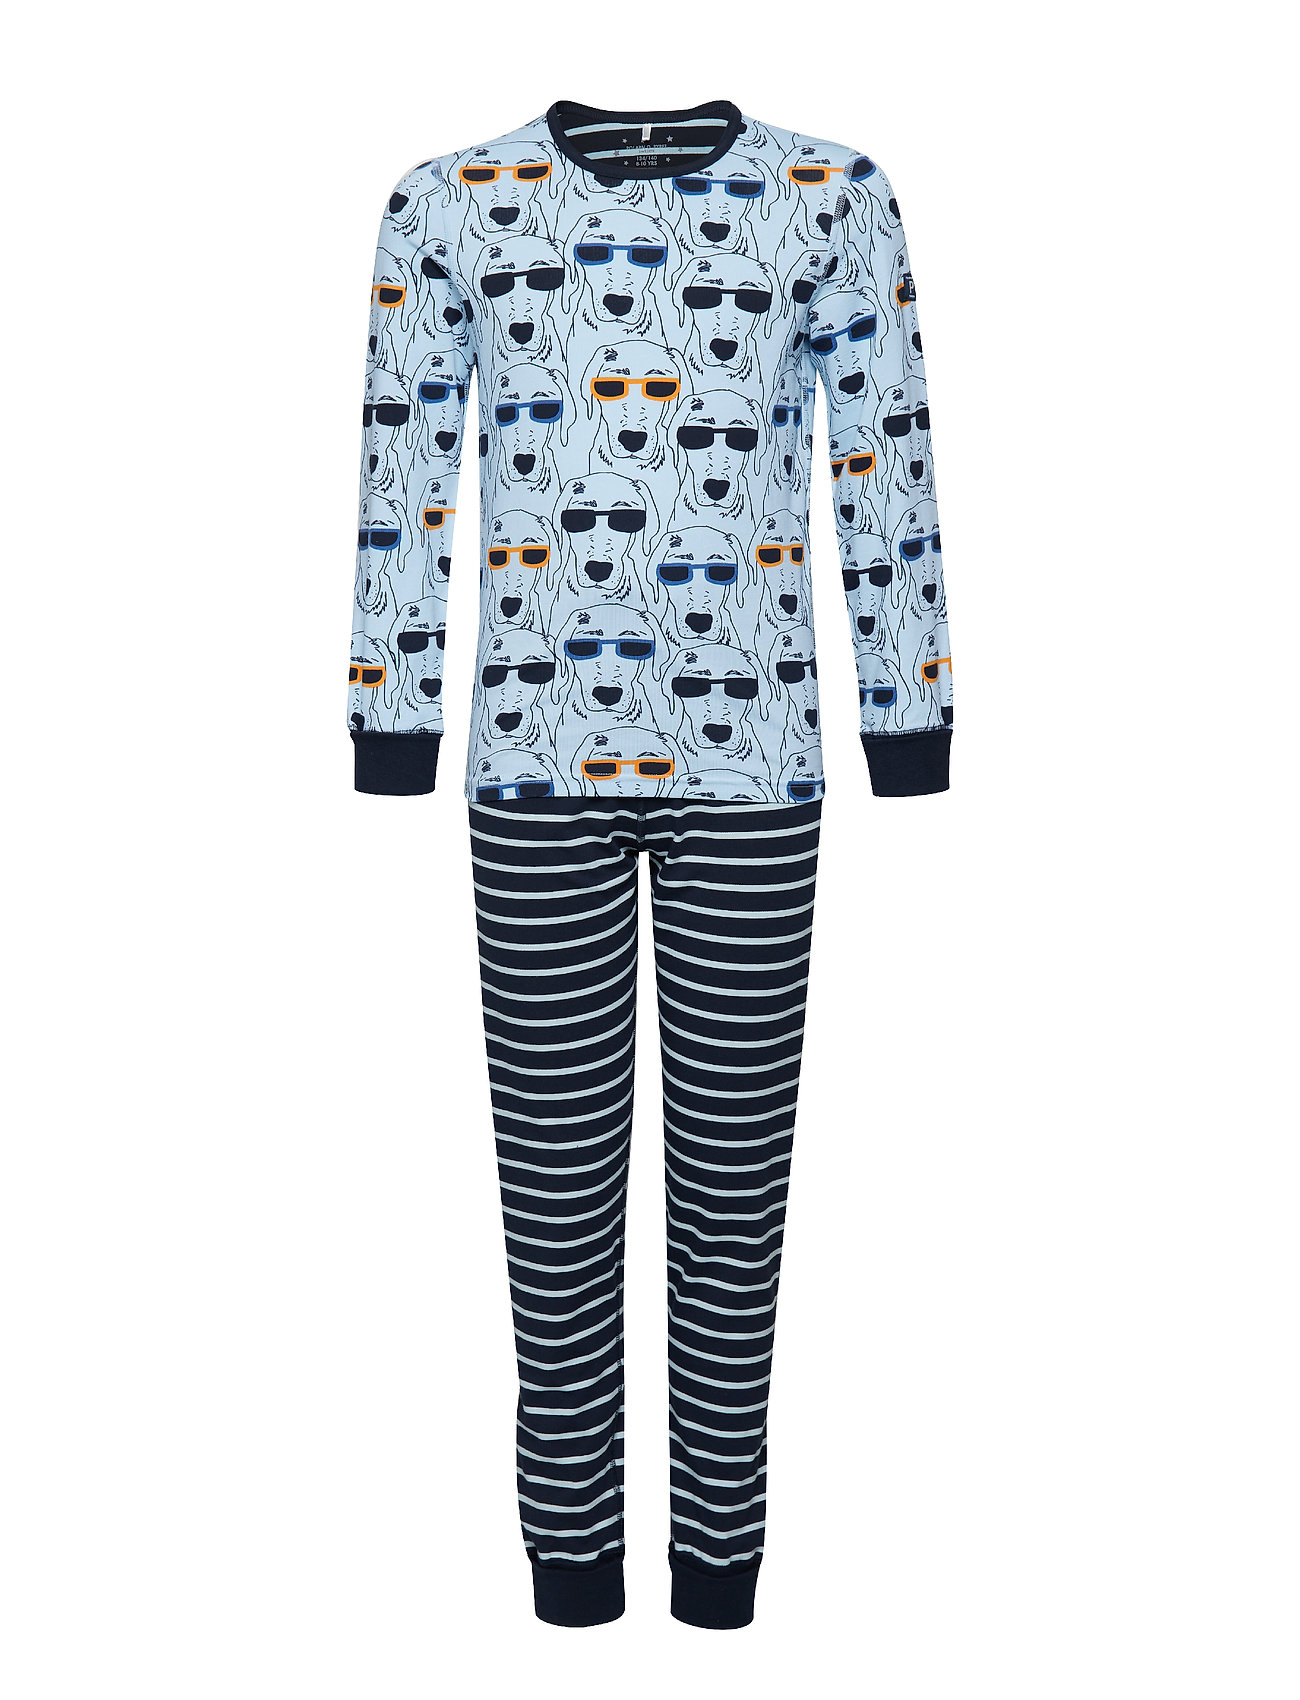 Polarn O. Pyret Pyjamas with print/Striped